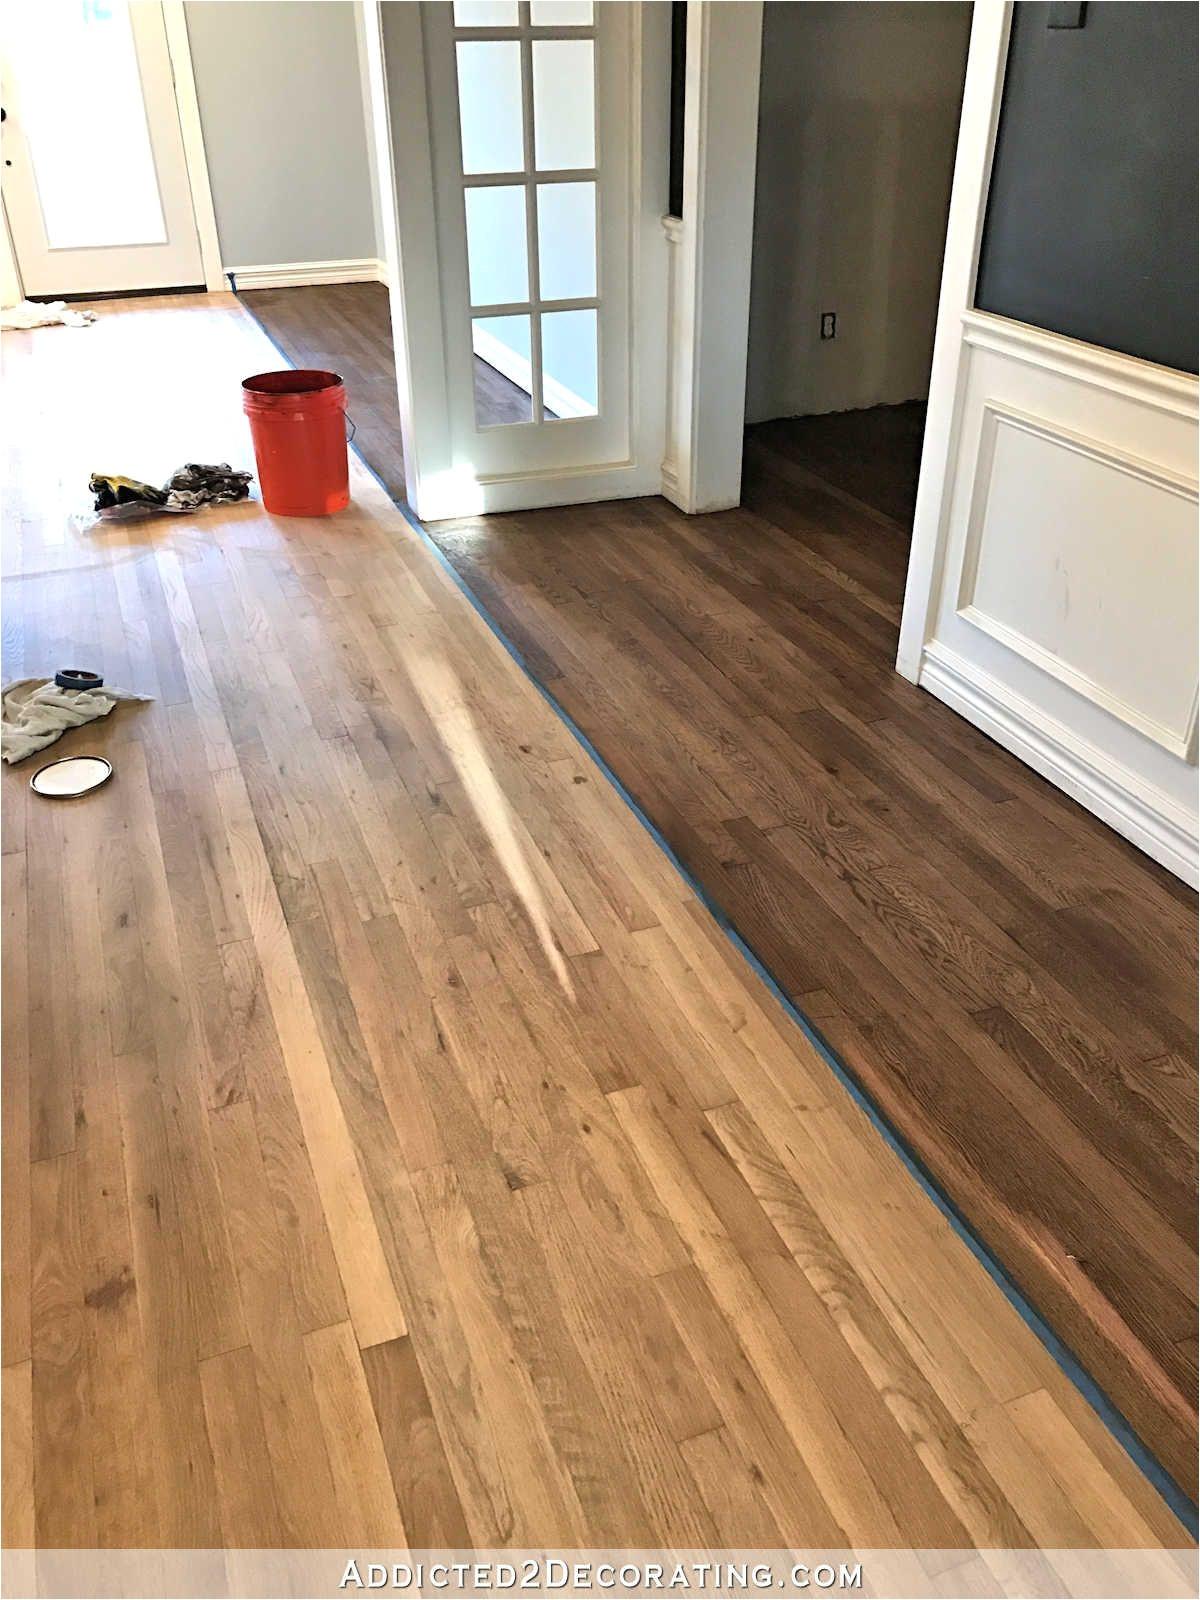 hardwood or laminate flooring cost of best laminate flooring made in usa 40 can you stain laminate with regard to best laminate flooring made in usa 40 can you stain laminate flooring inspiration